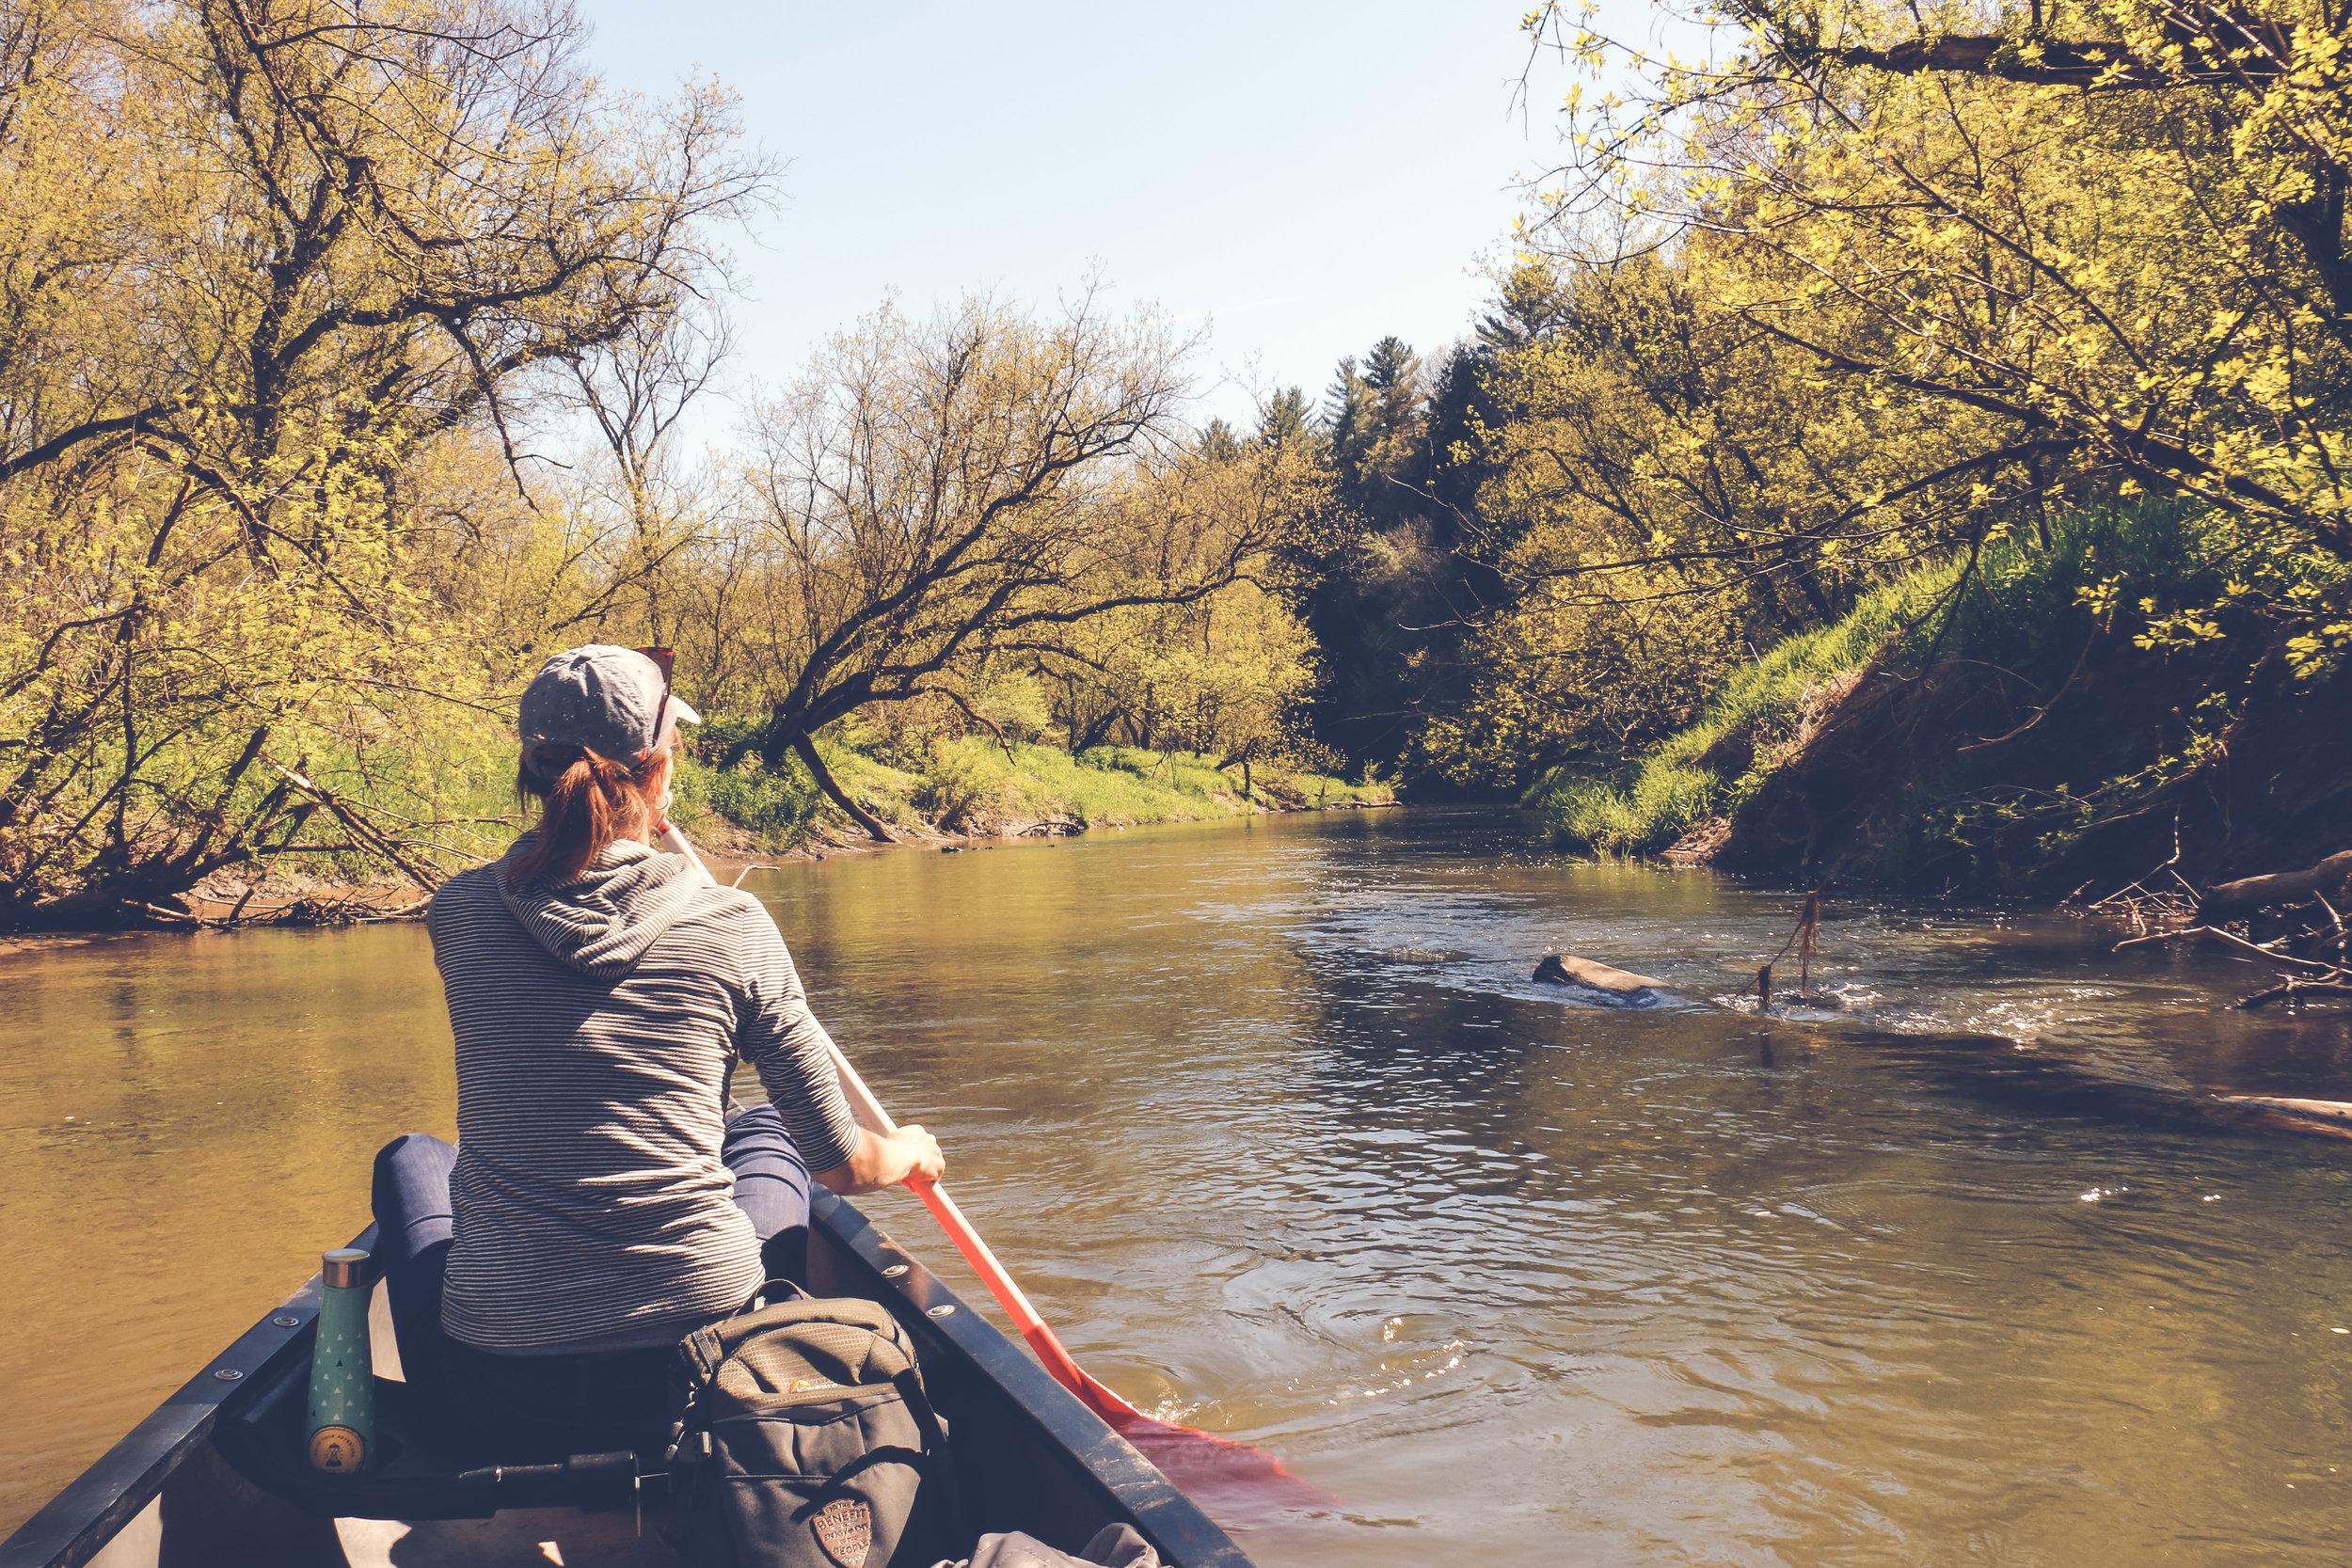 The Kickapoo River